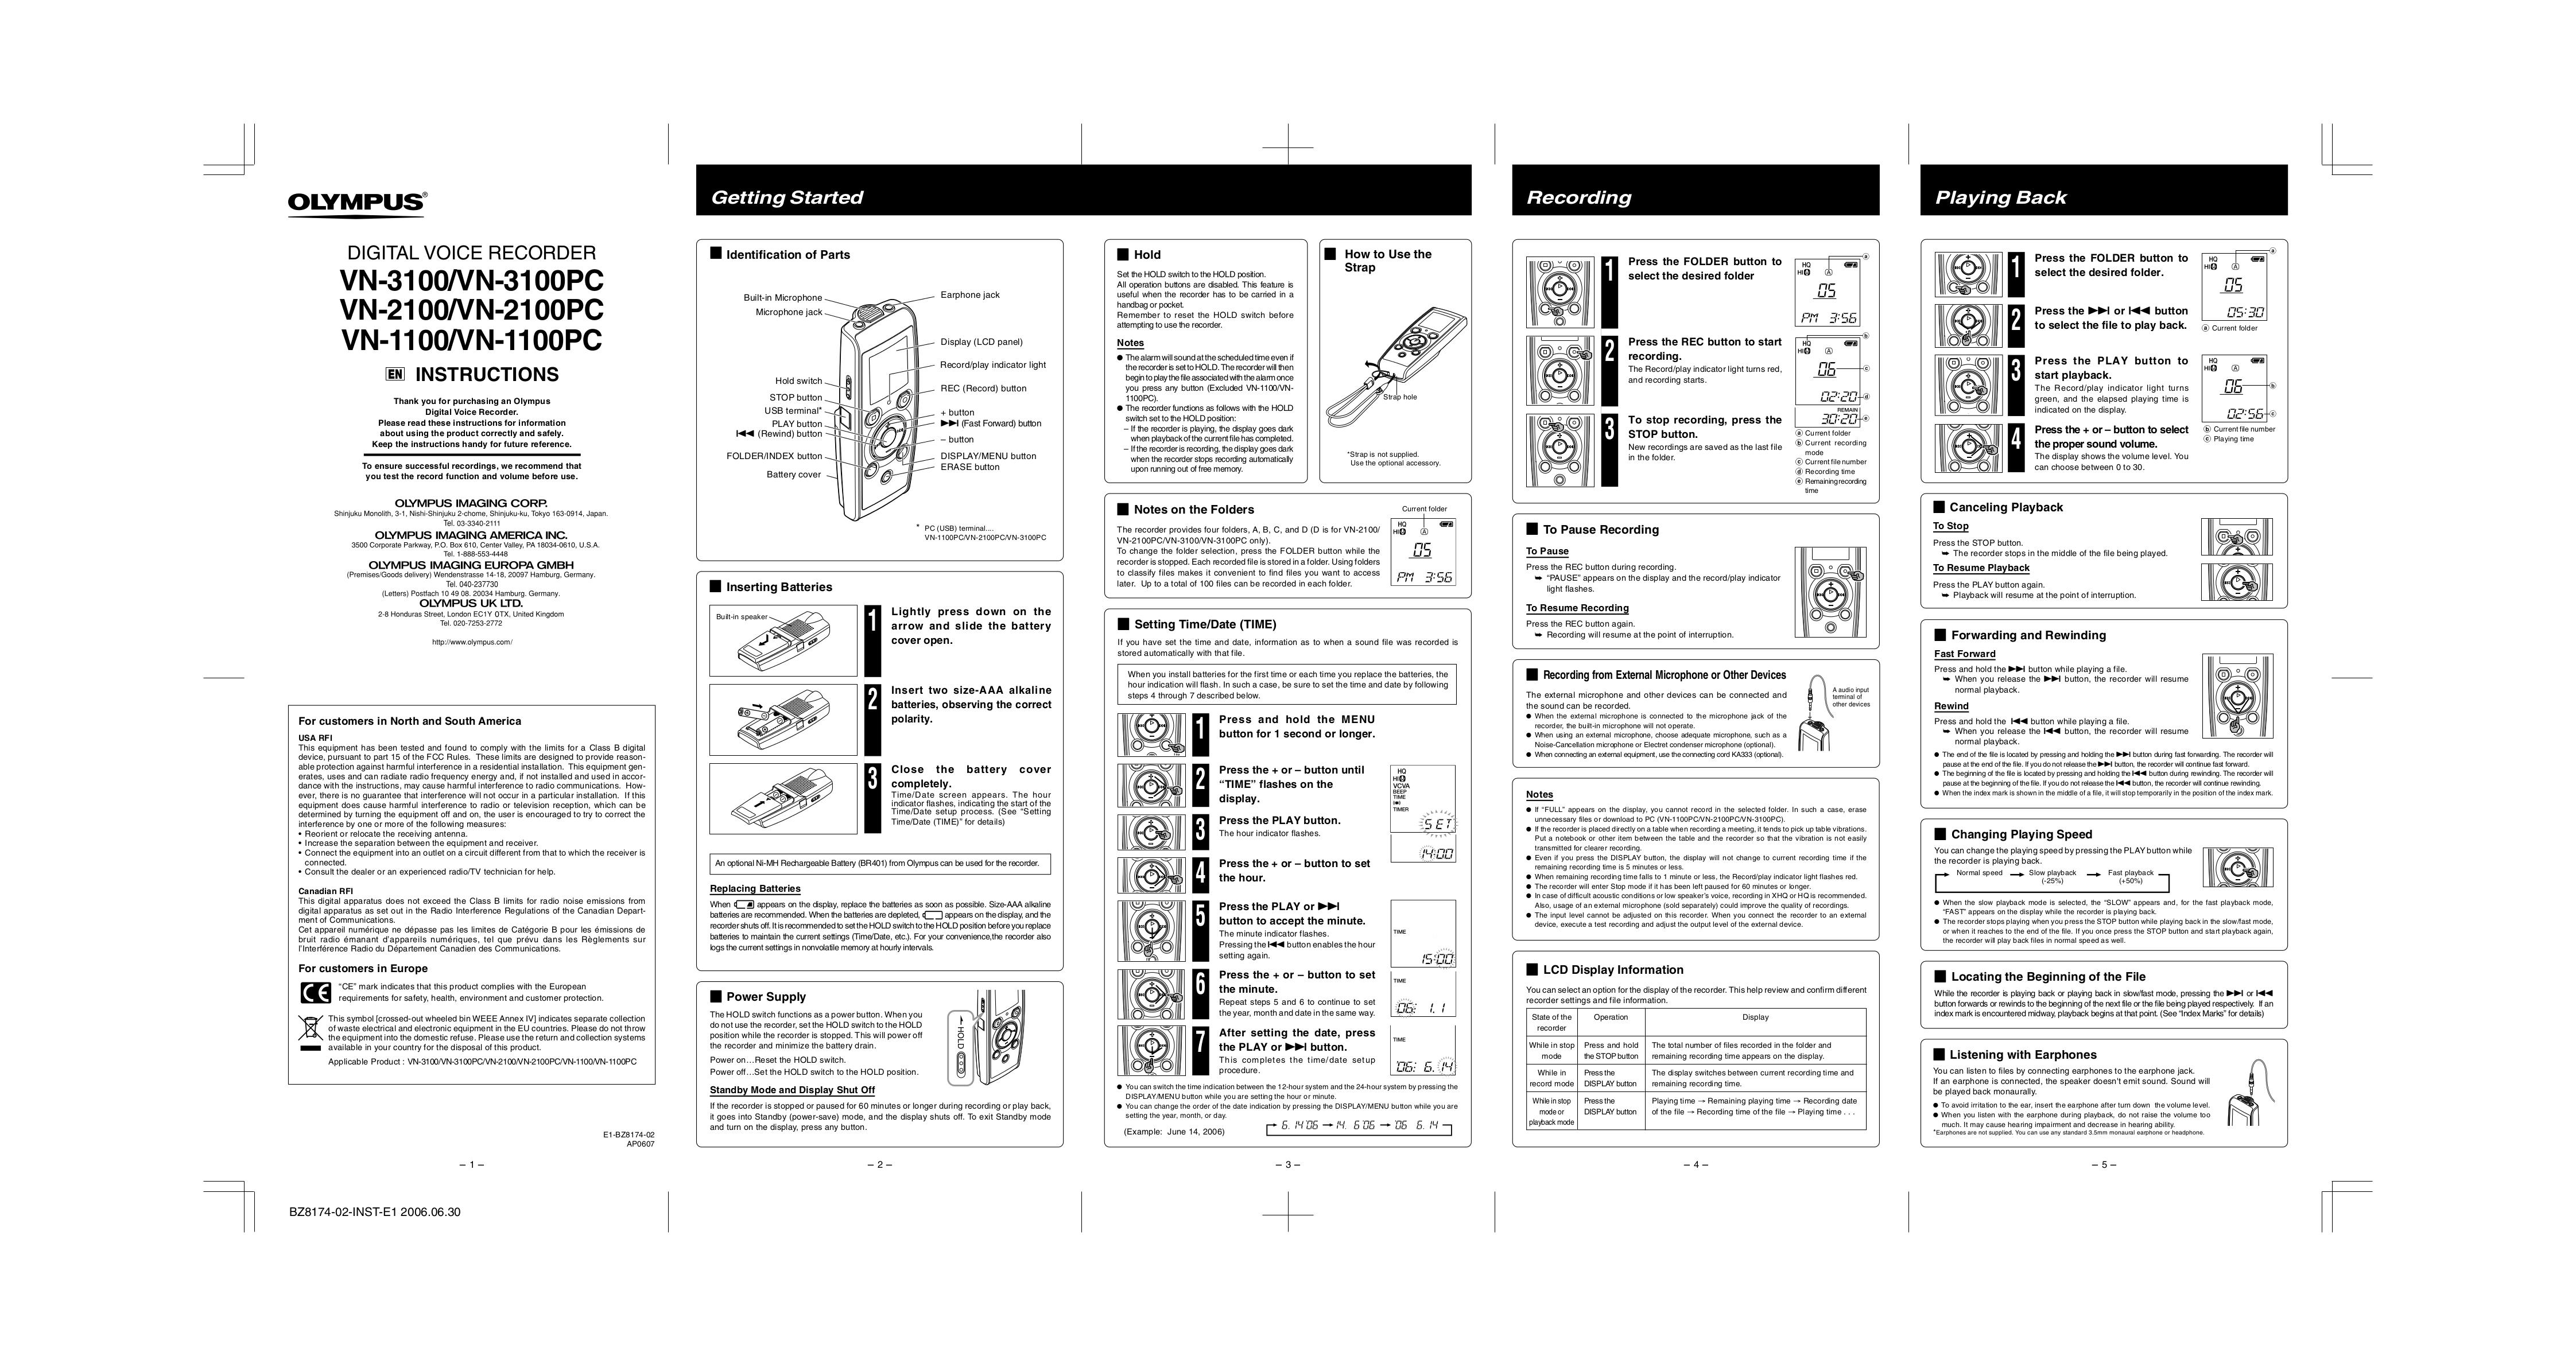 download free pdf for olympus vn3100pc voice recorder manual rh umlib com olympus vn-3100pc mode d'emploi olympus digital voice recorder vn-3100 manual